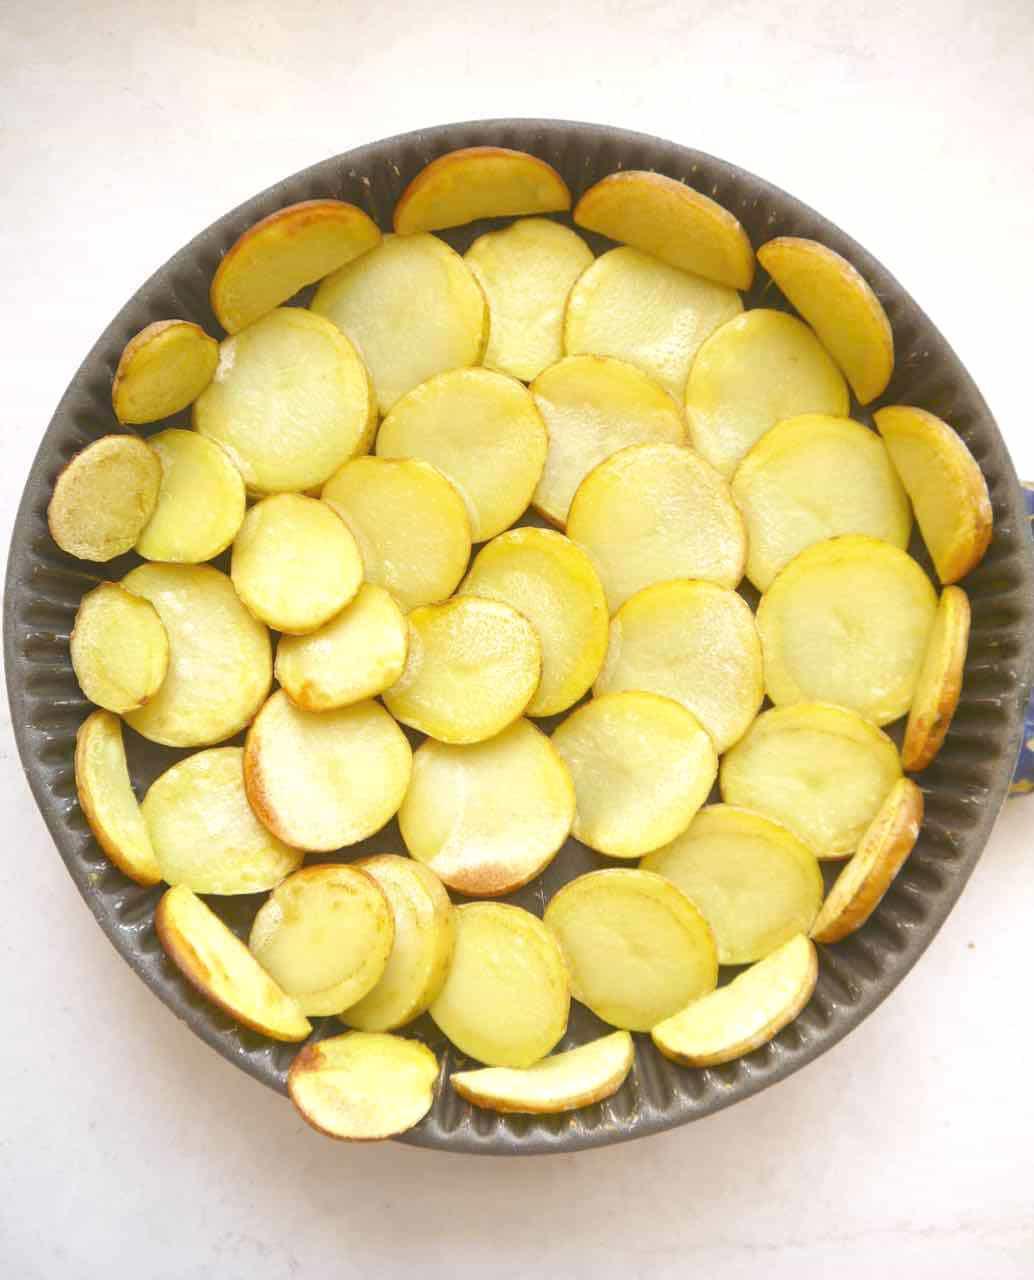 Gluten-Free Quiche Lorraine with a Potato Crust | Perchance to Cook, www.perchancetocook.com